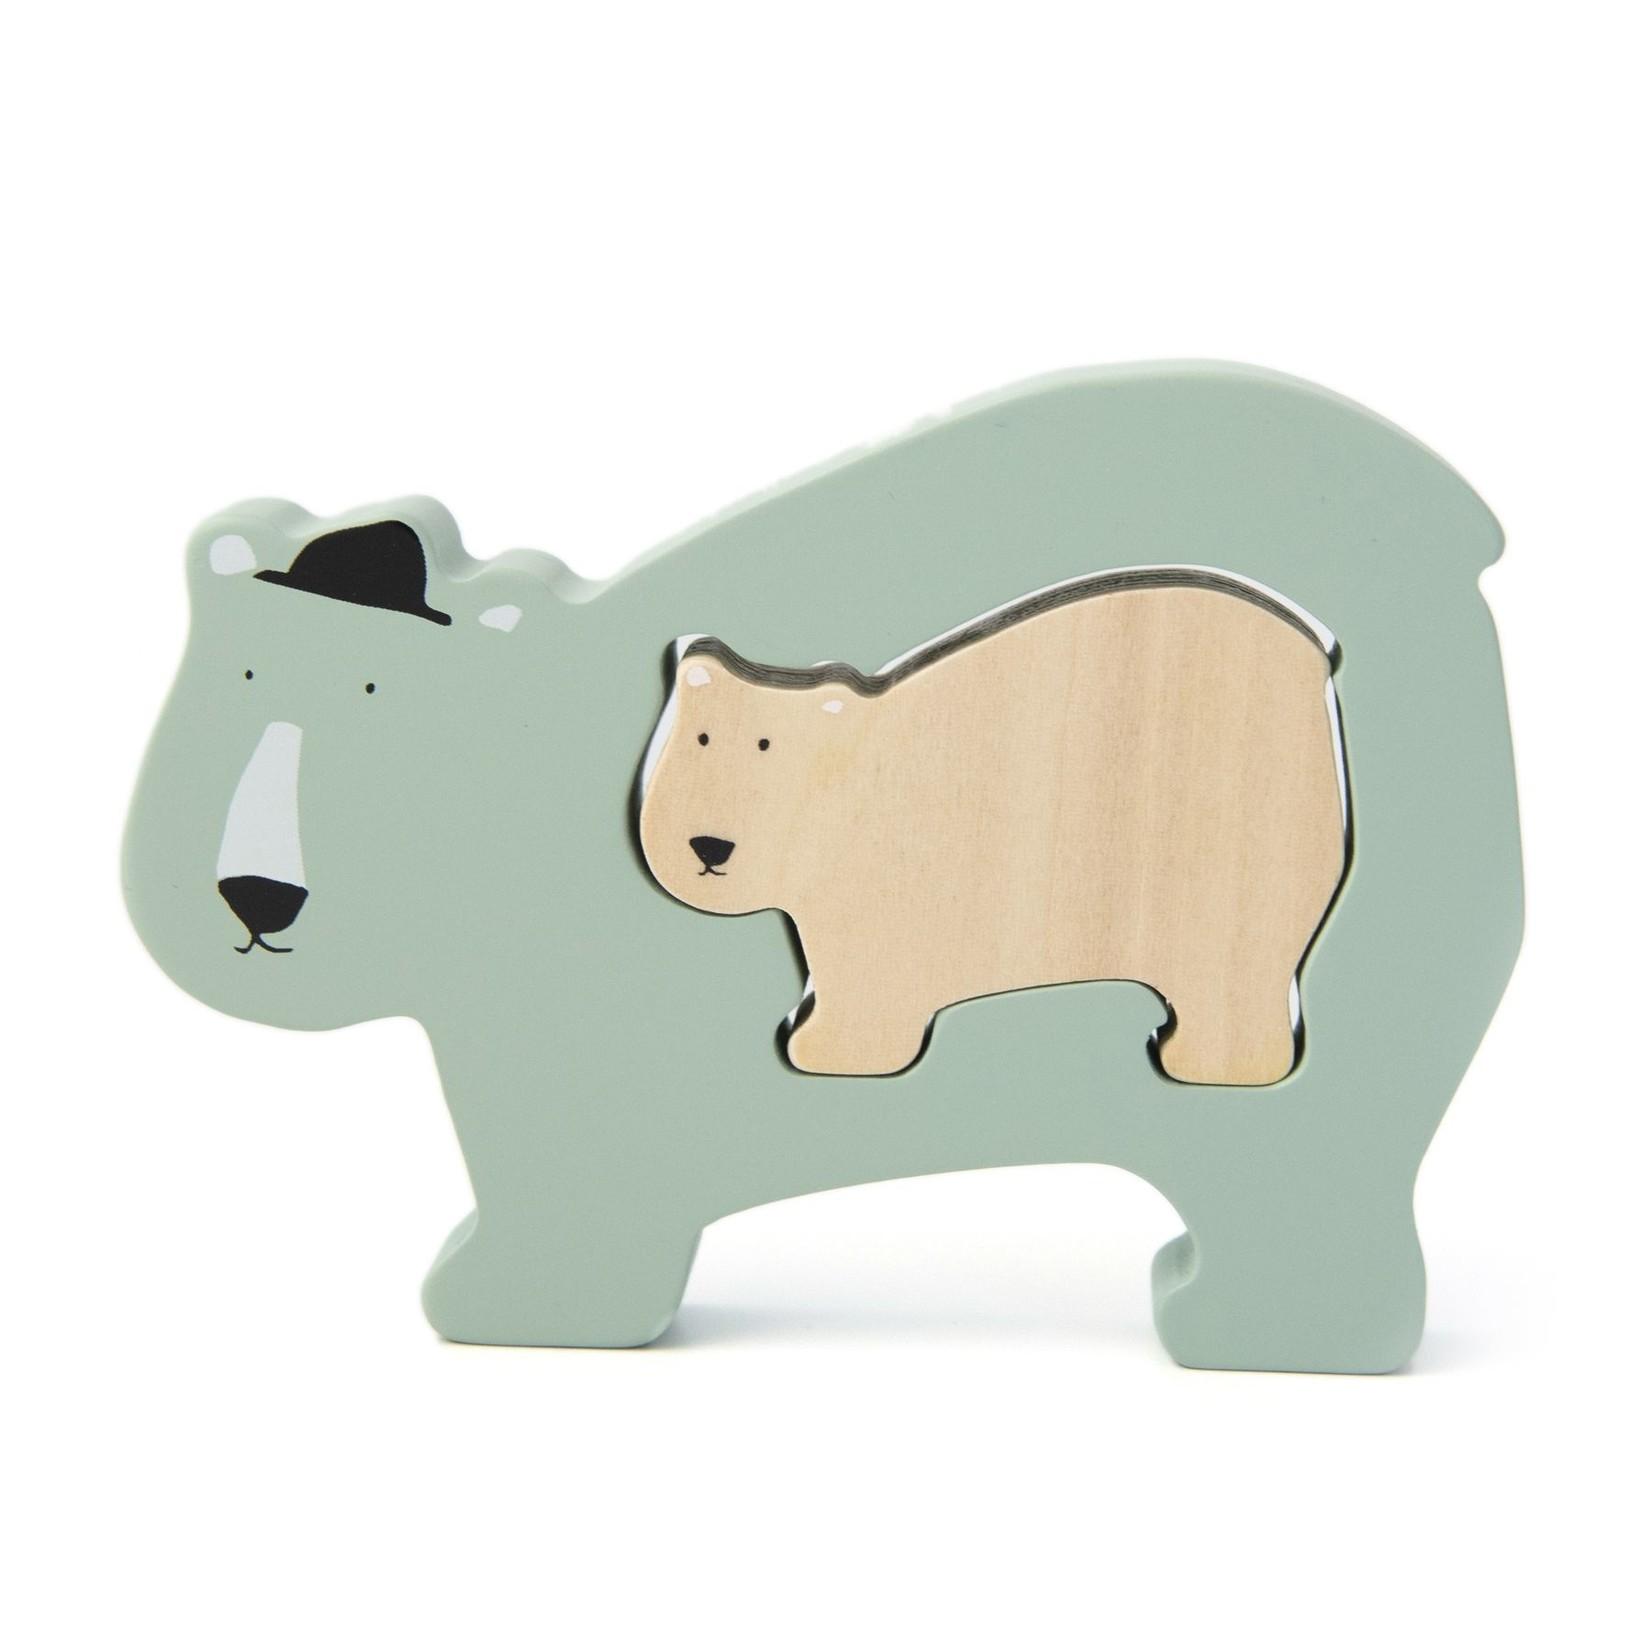 Trixie Trixie Houten baby puzzel Mr. Polar bear